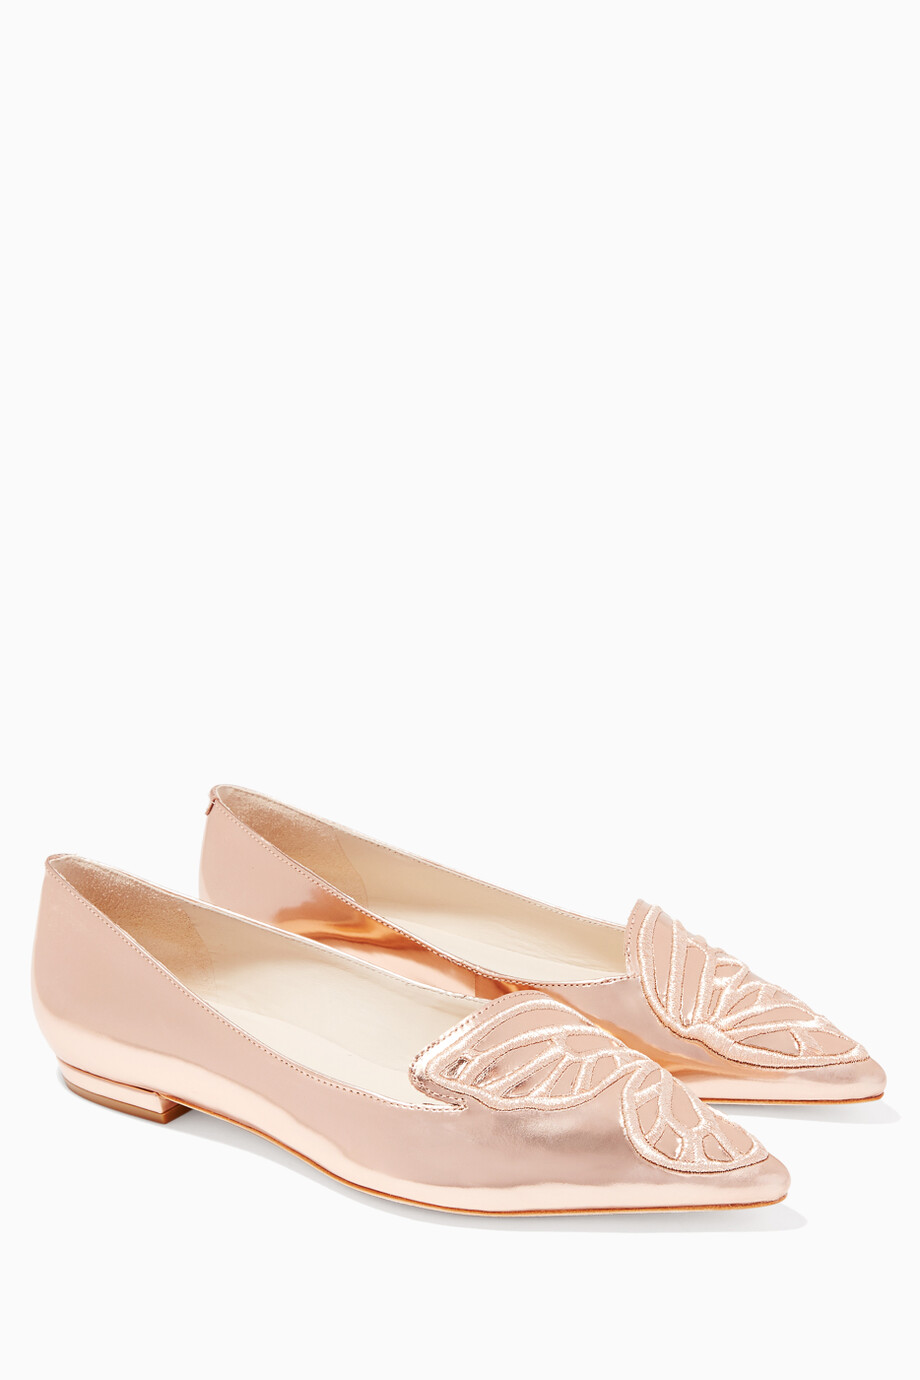 946aeab864f Shop Sophia Webster Gold Bibi Butterfly Rose-Gold Flats for Women ...